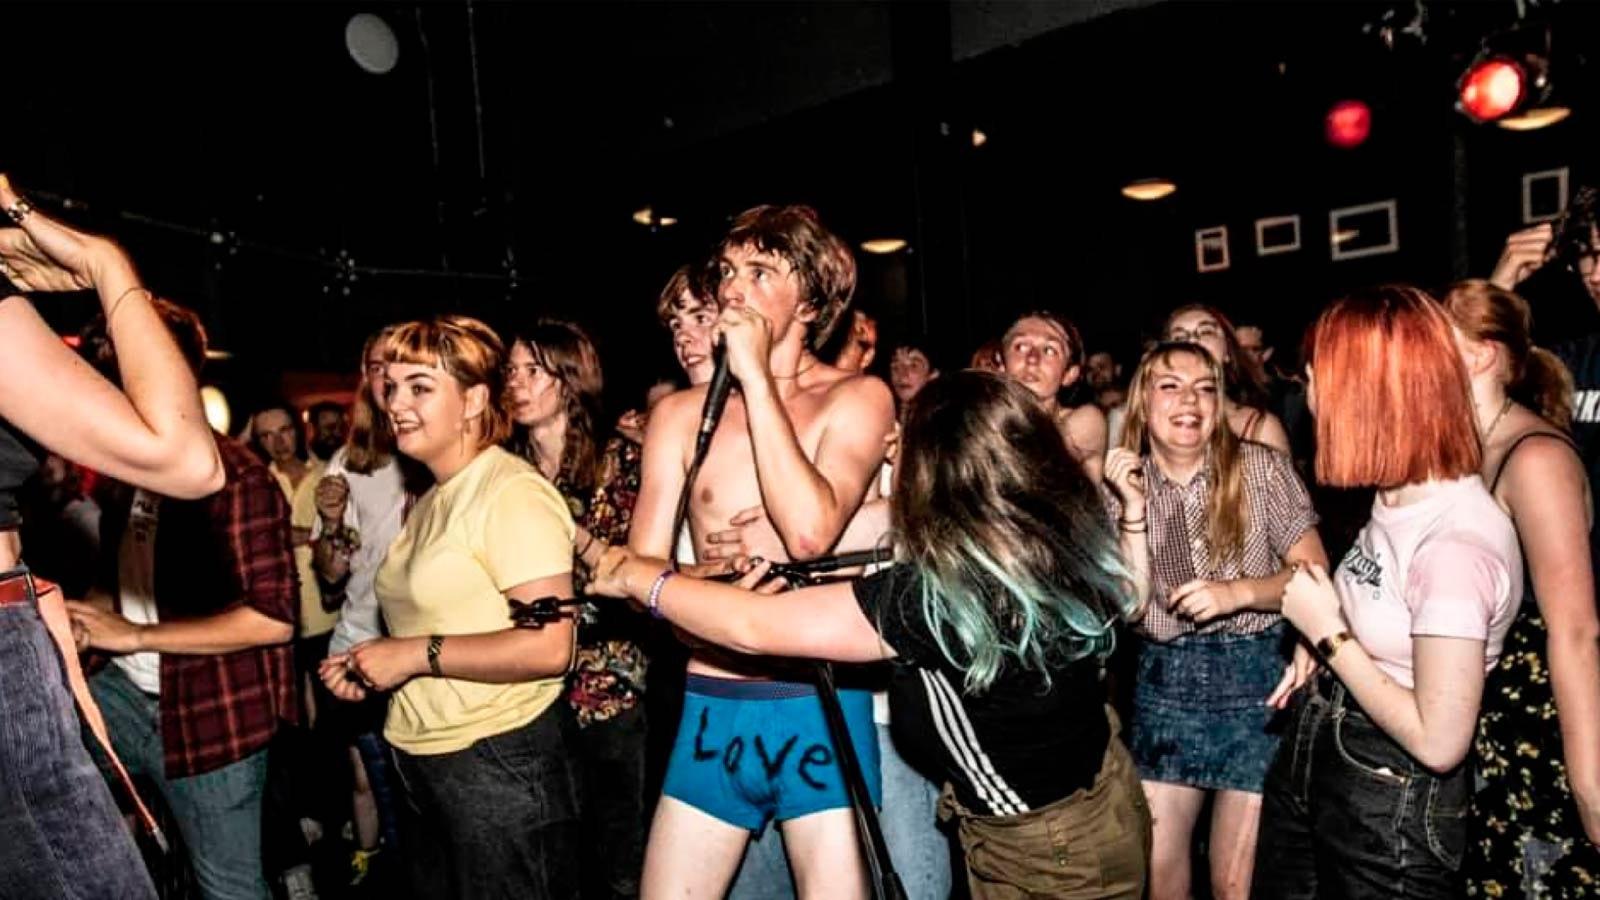 Lovejoy | Newcastle, Think Tank?